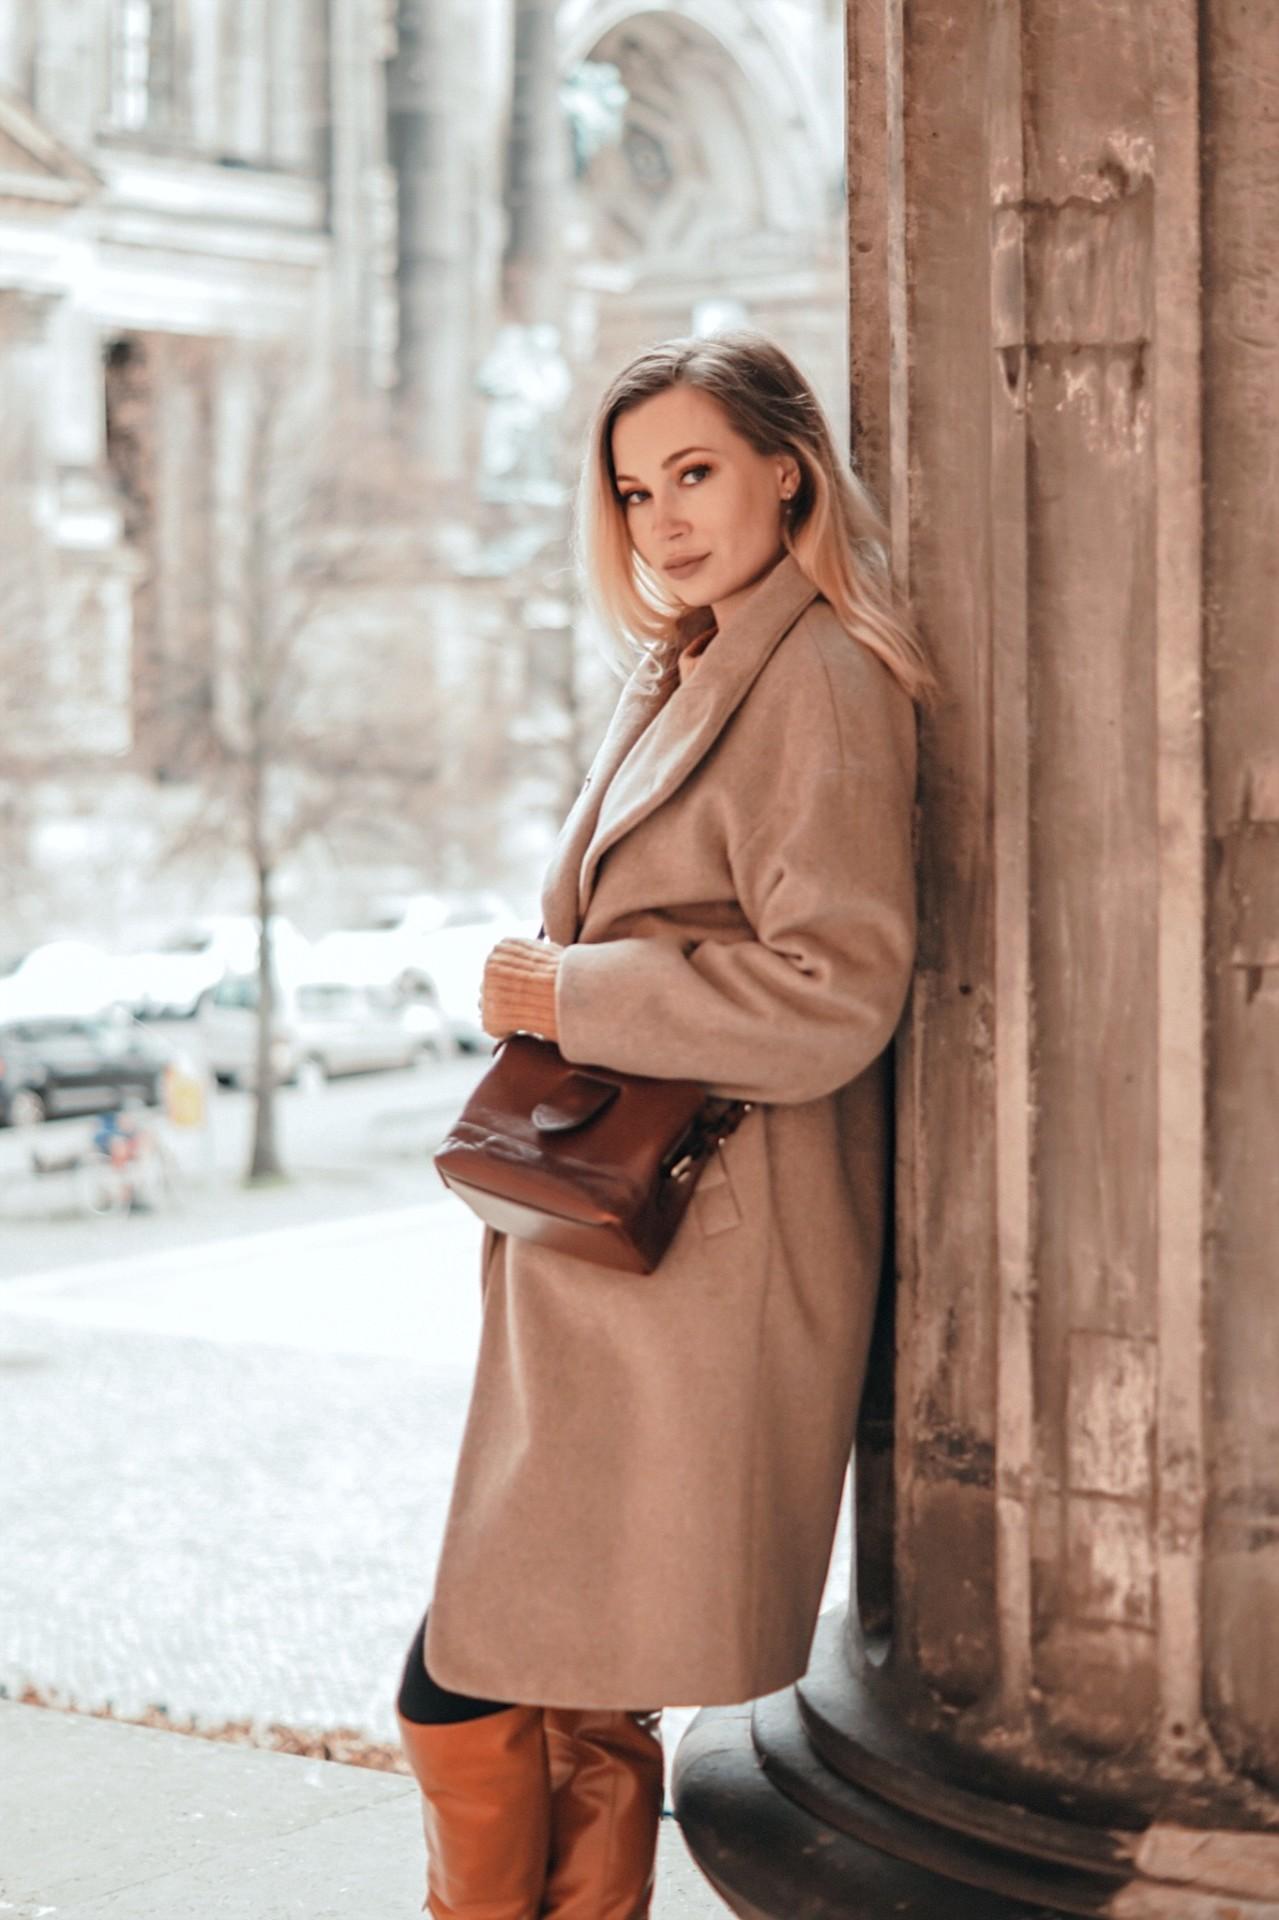 dbkstylez_cocoon_coat_berlin_streetstyle_fashionblogger